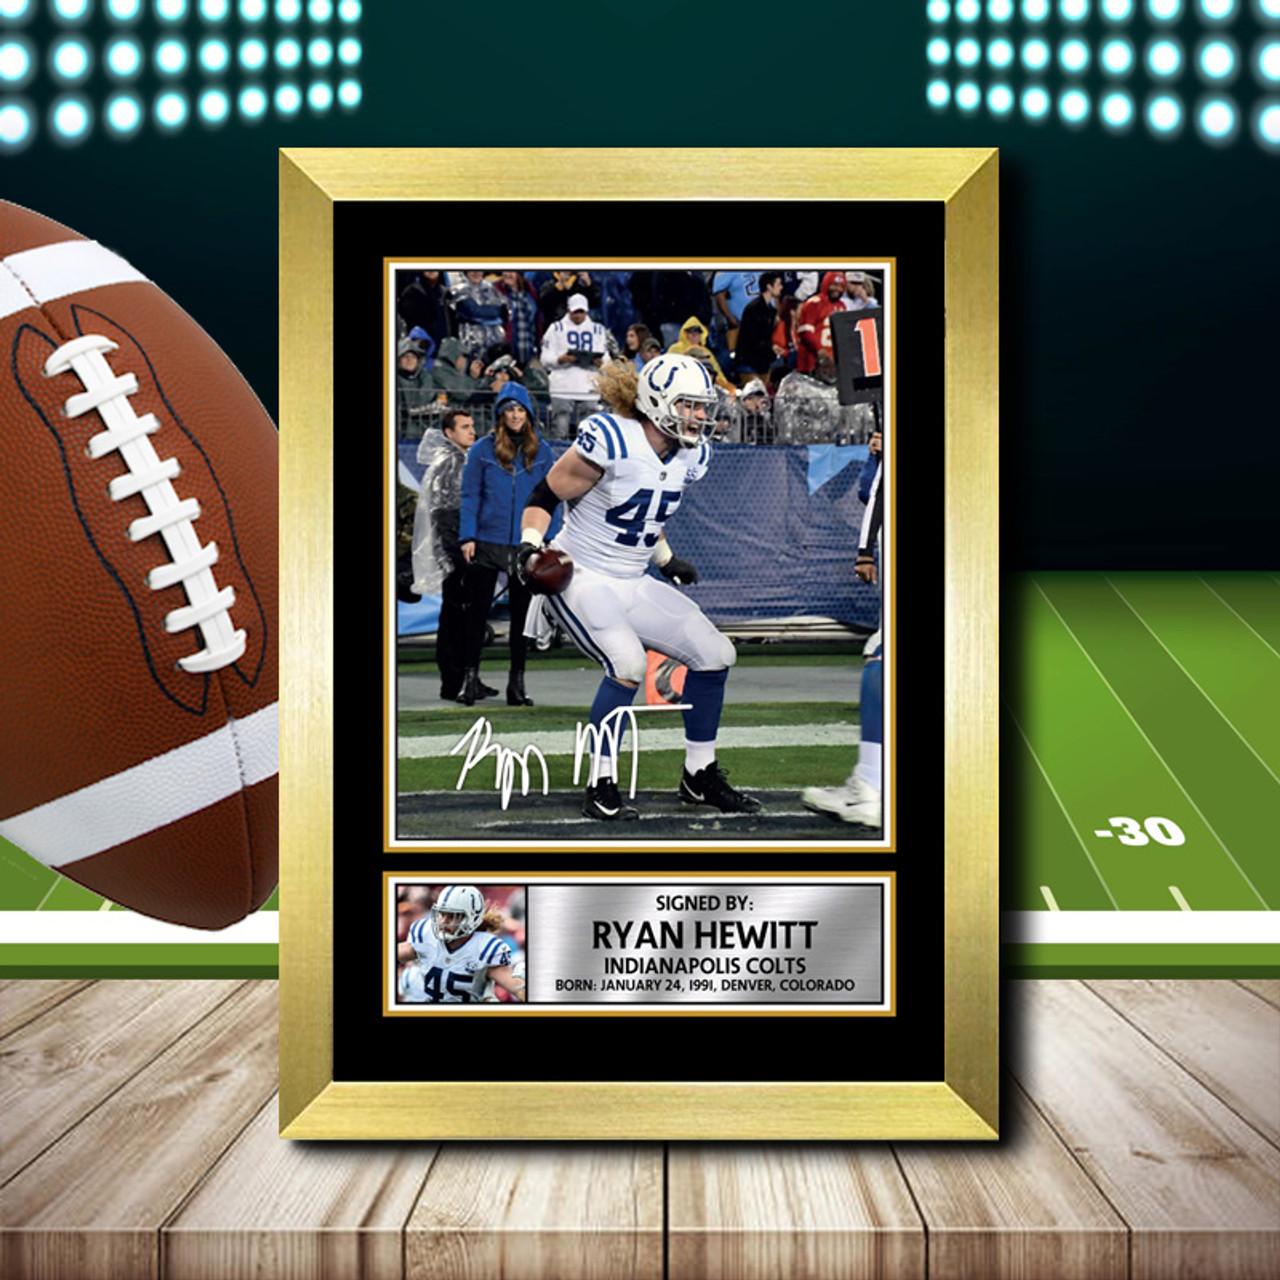 Ryan Hewitt 2 - Signed Autographed NFL Star Print